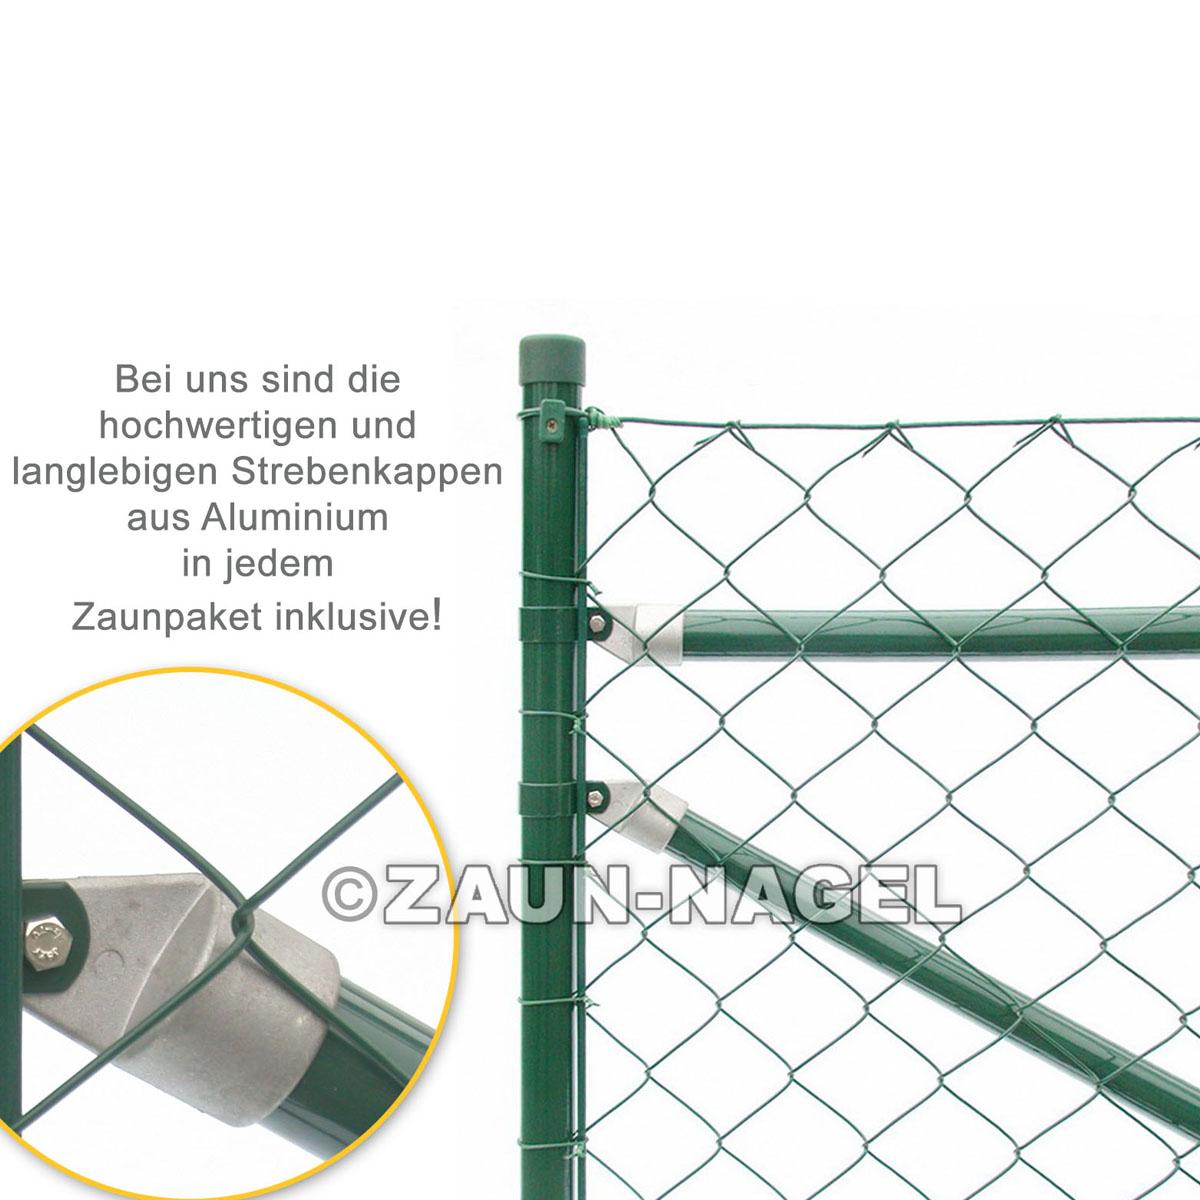 Zaun-Nagel - Maschendrahtzaun Set inkl. Handbagger